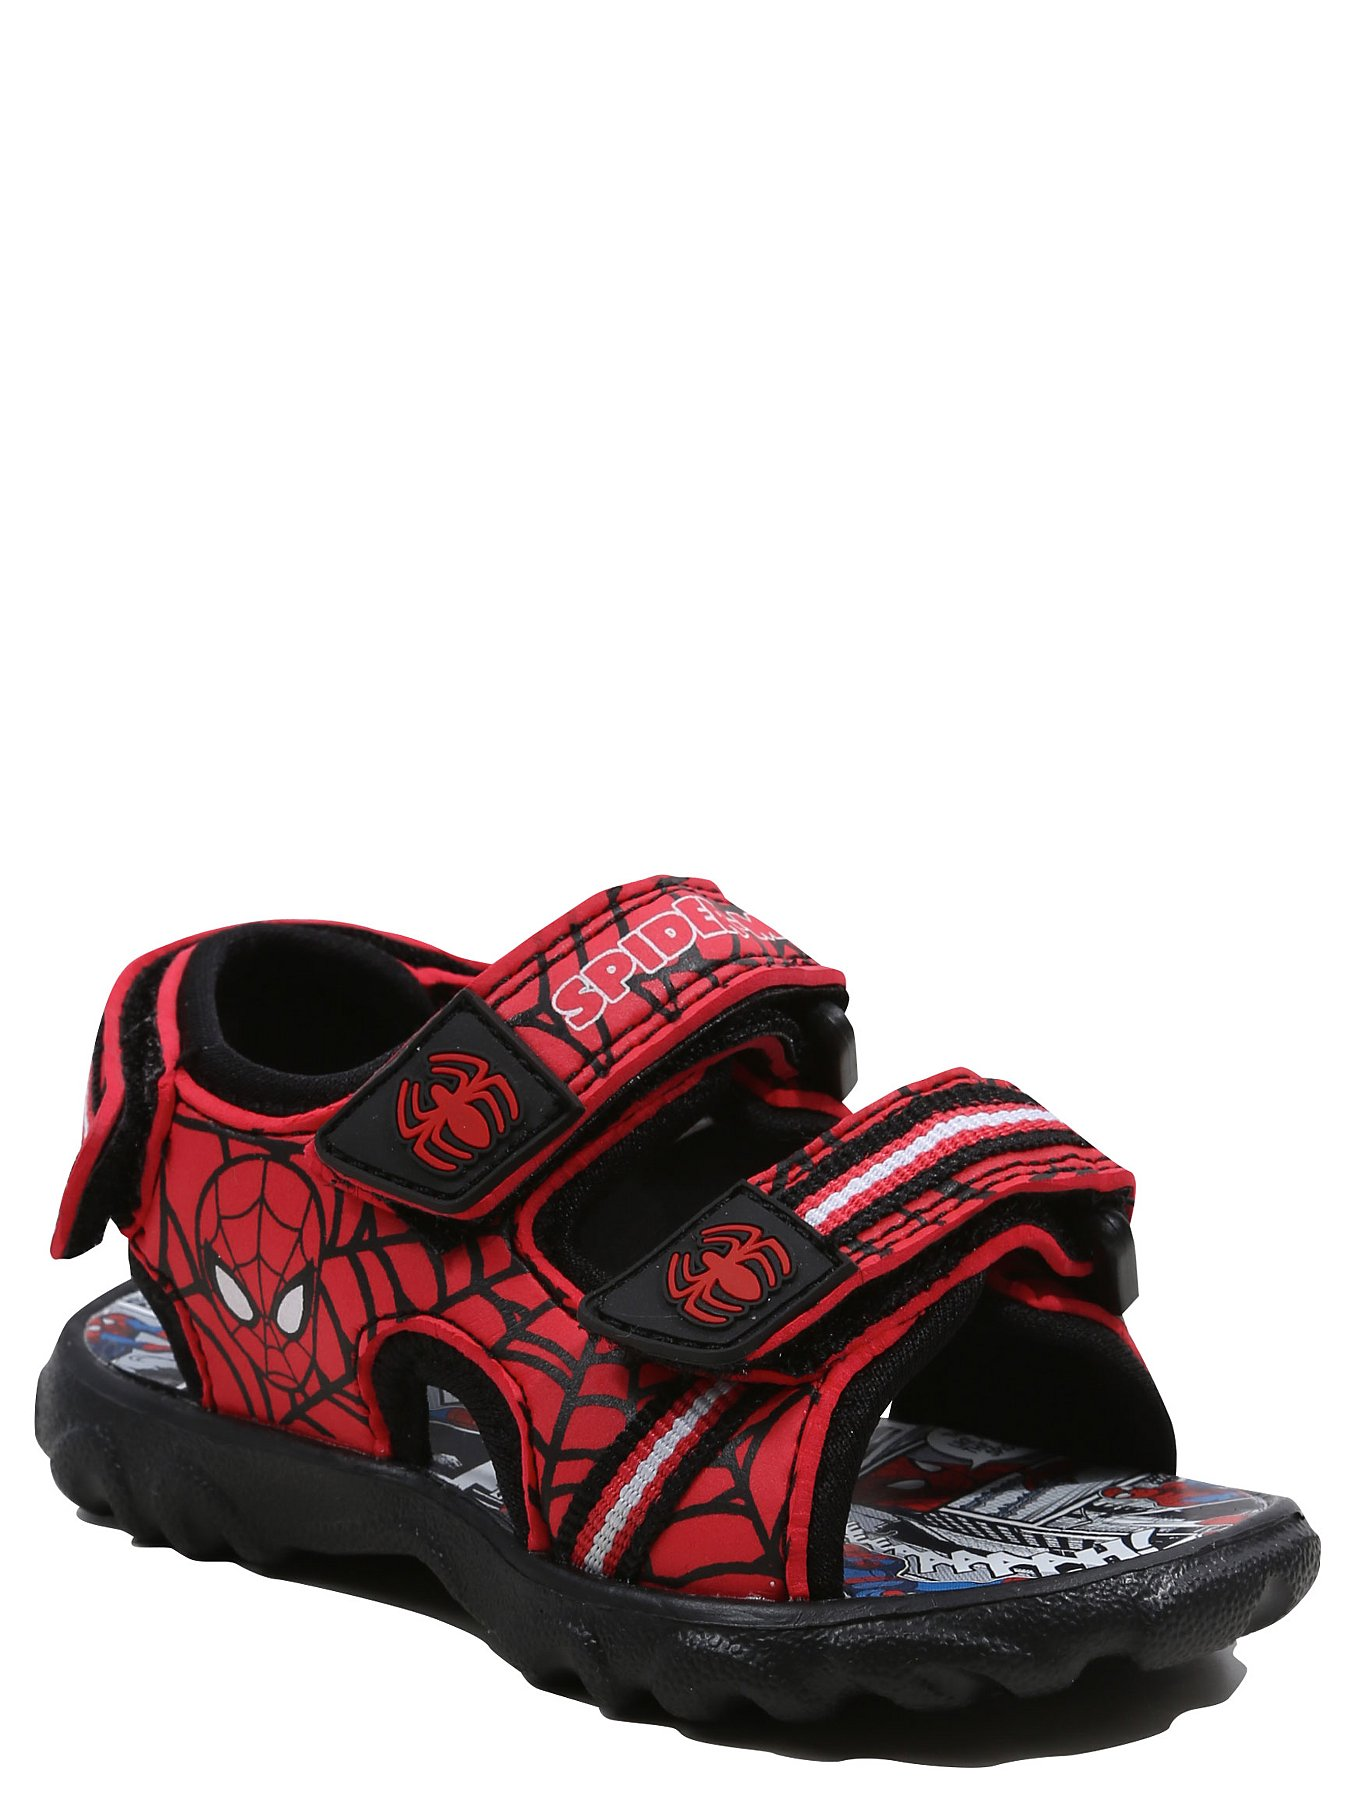 Black sandals asda - Black Sandals Asda 37